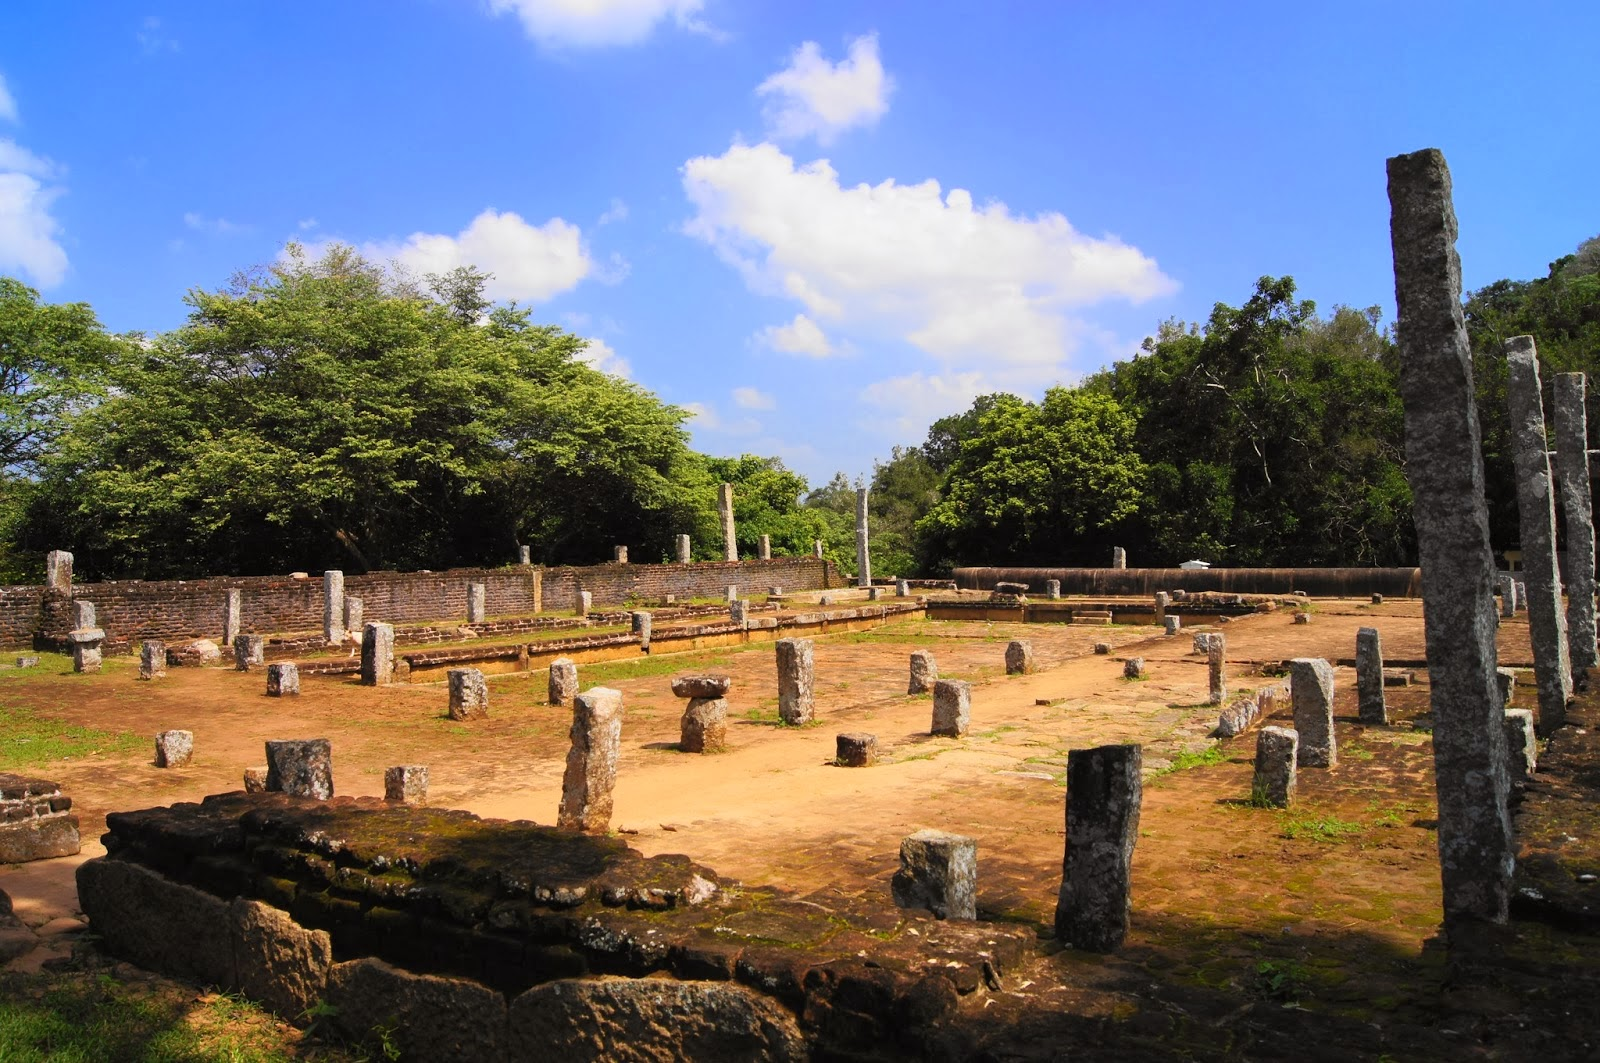 ruins of monastery's refectory Mihintale, columns of sandstone, brick walls, stone trough